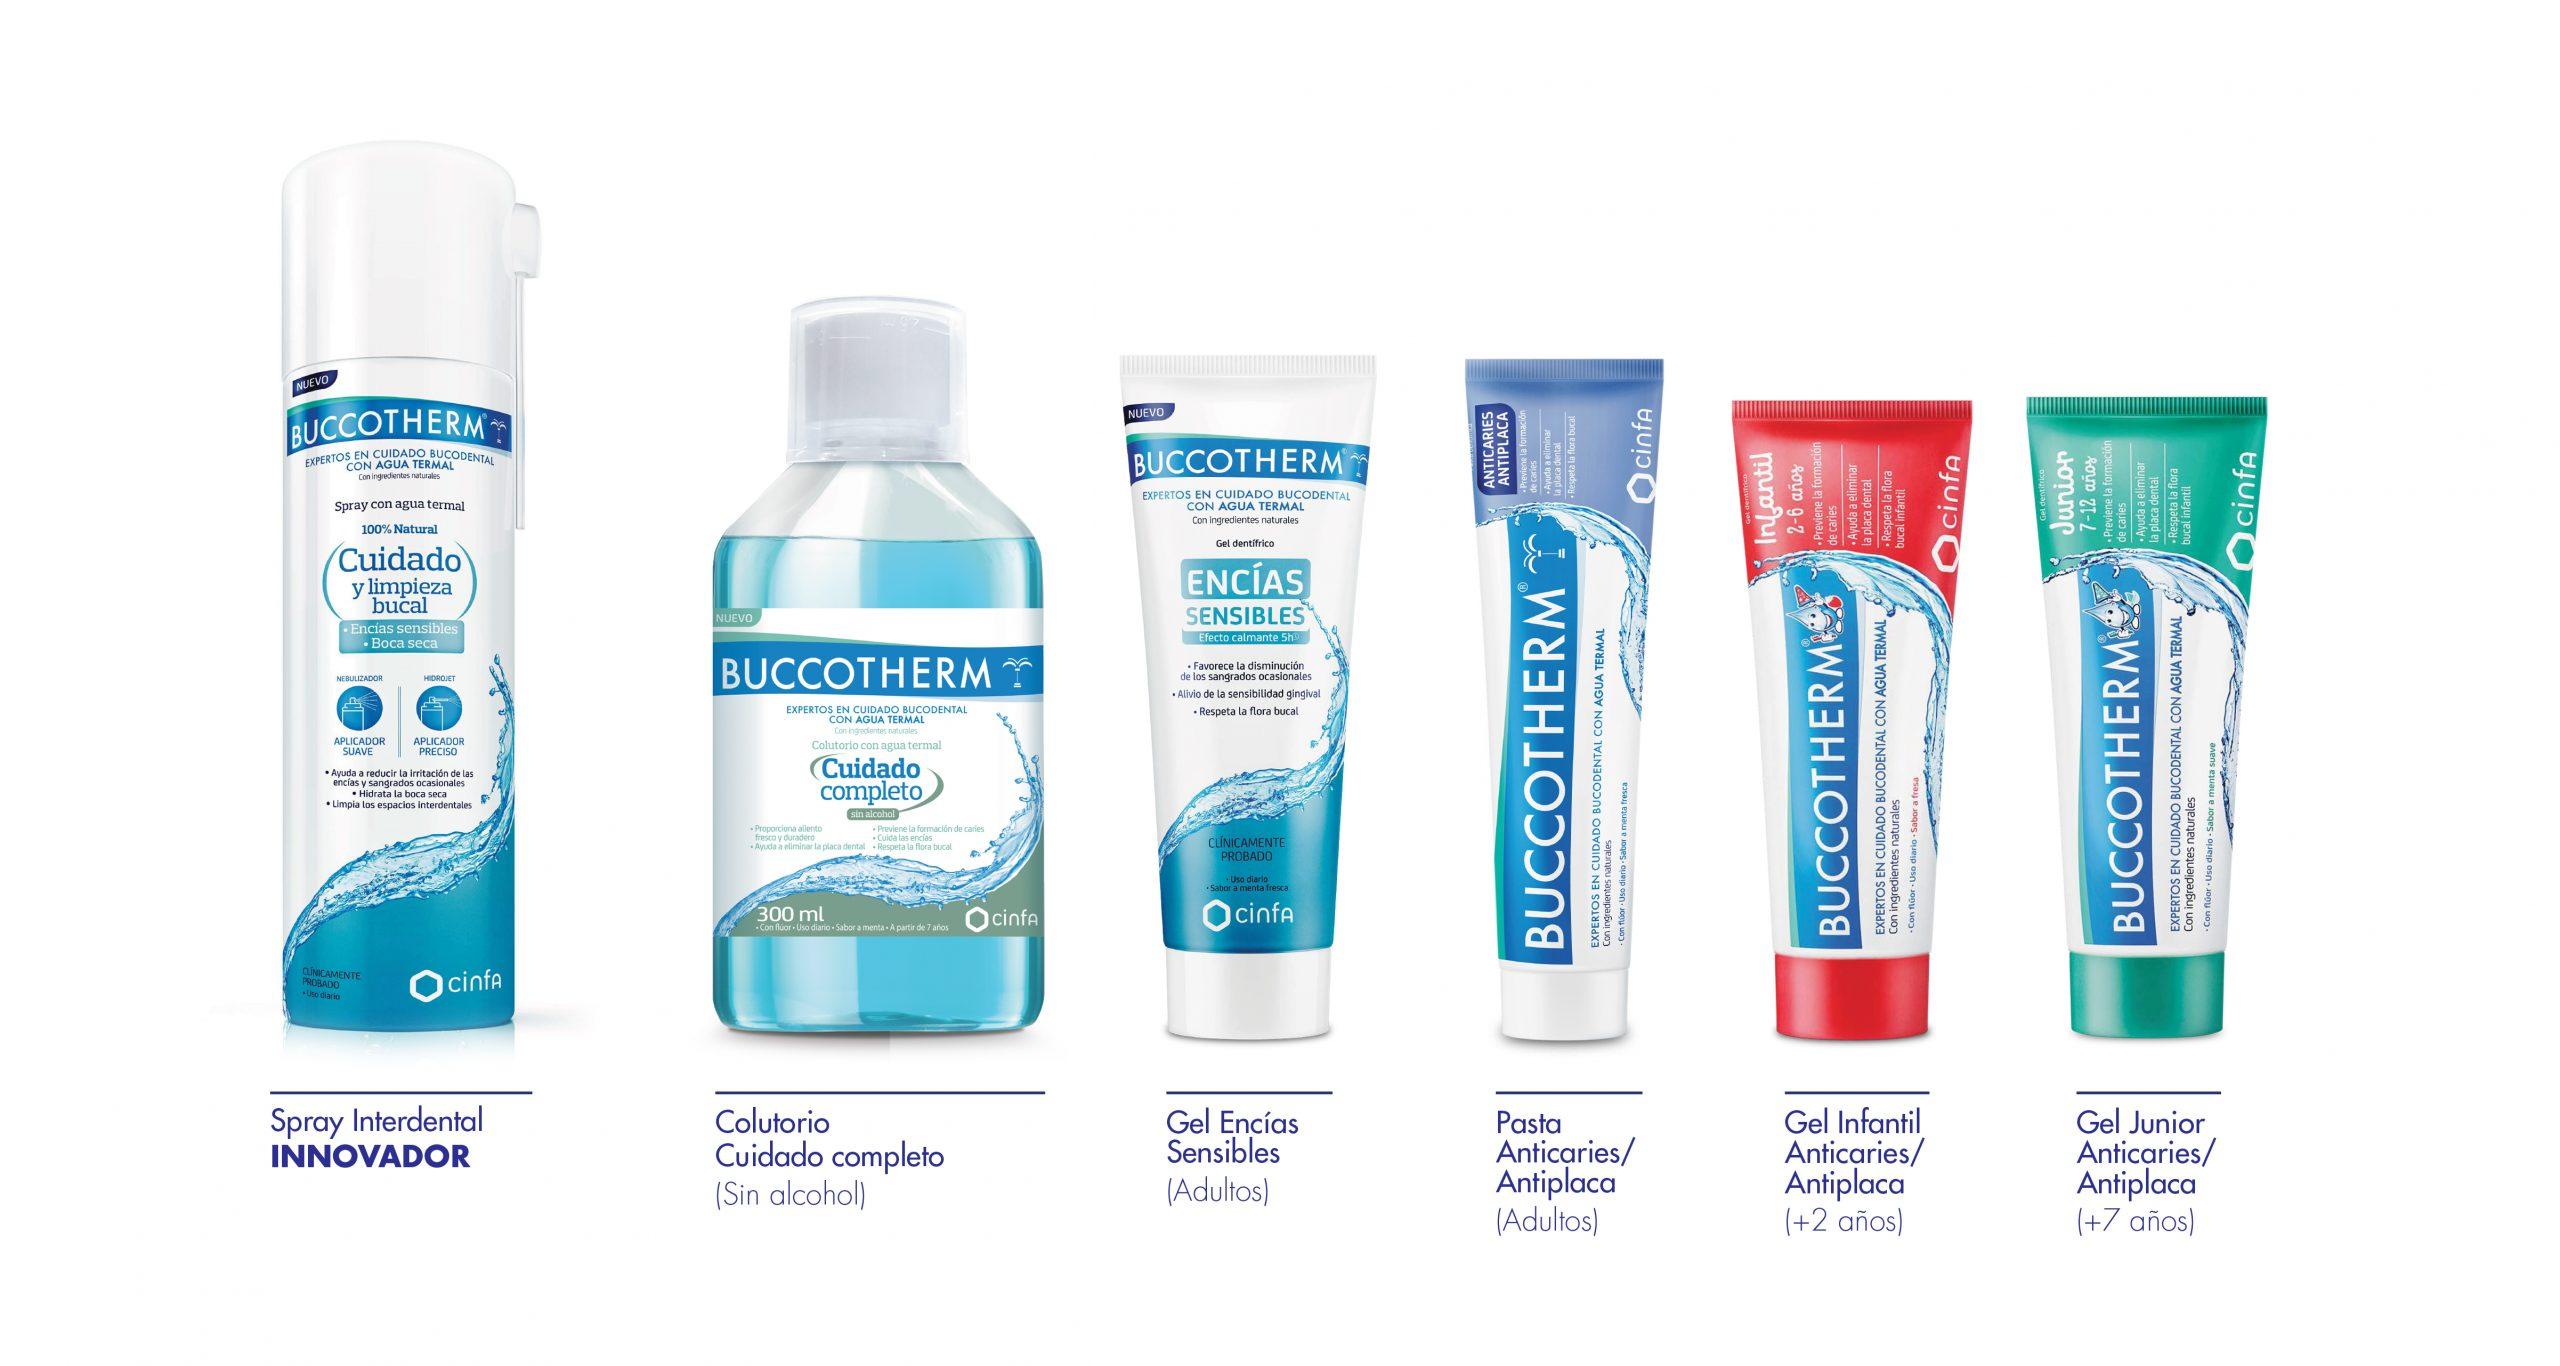 BUCCOTHERM productos seguros eficaces naturales